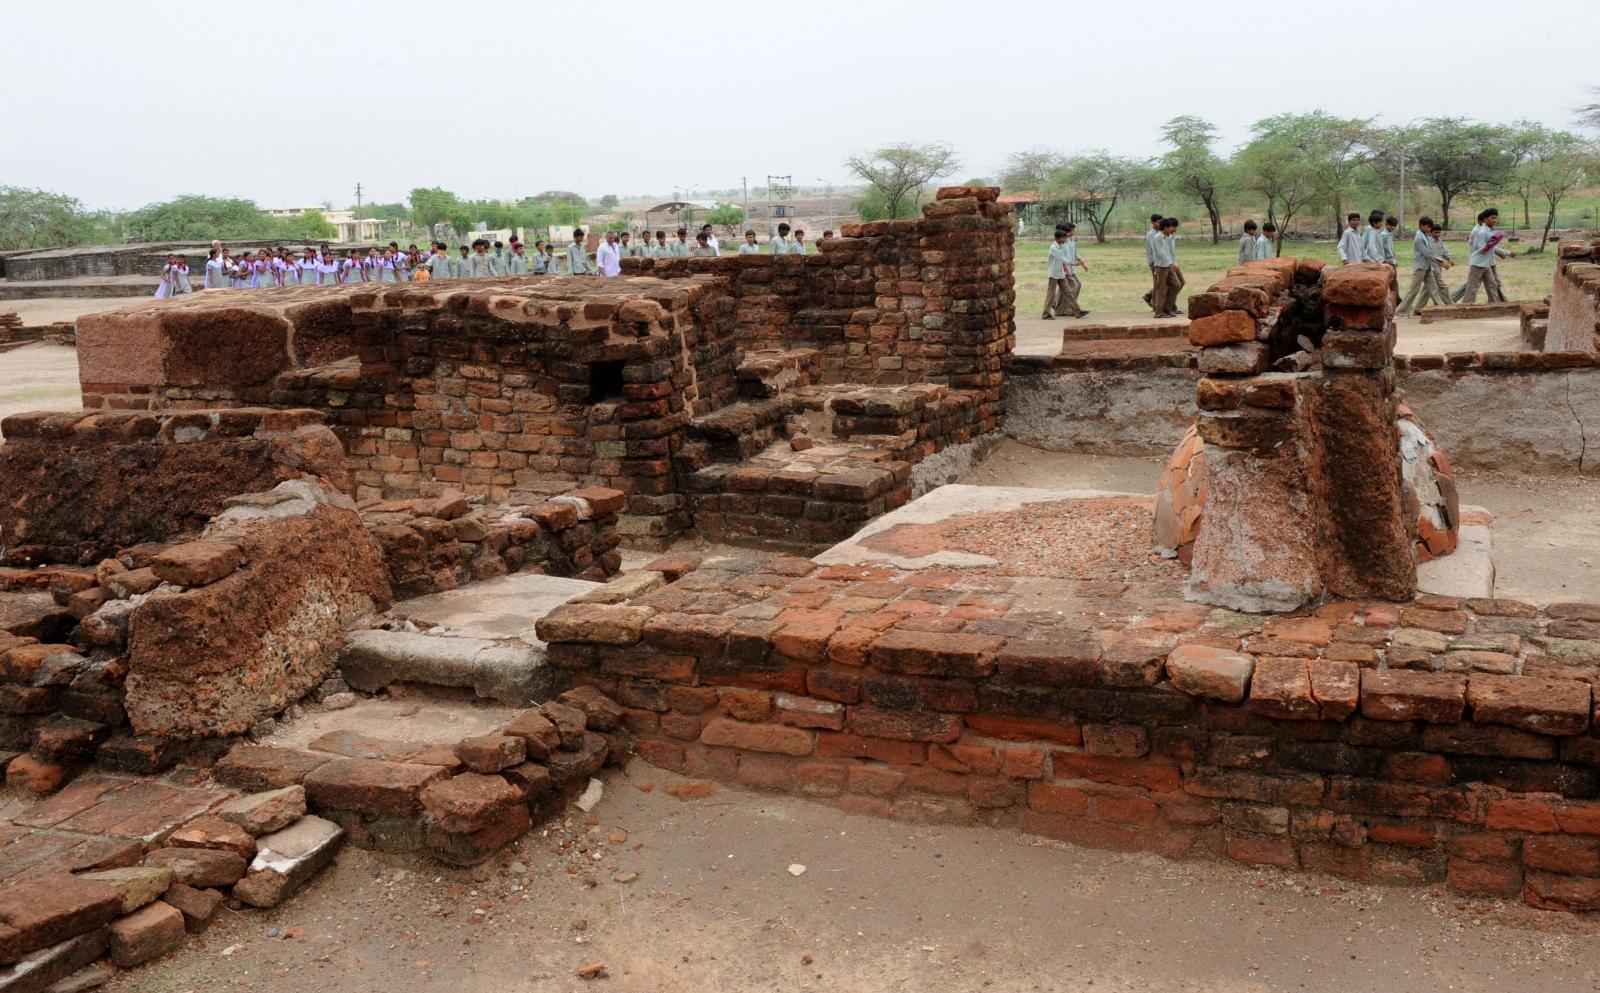 Lothal, Indus Valley Civilization